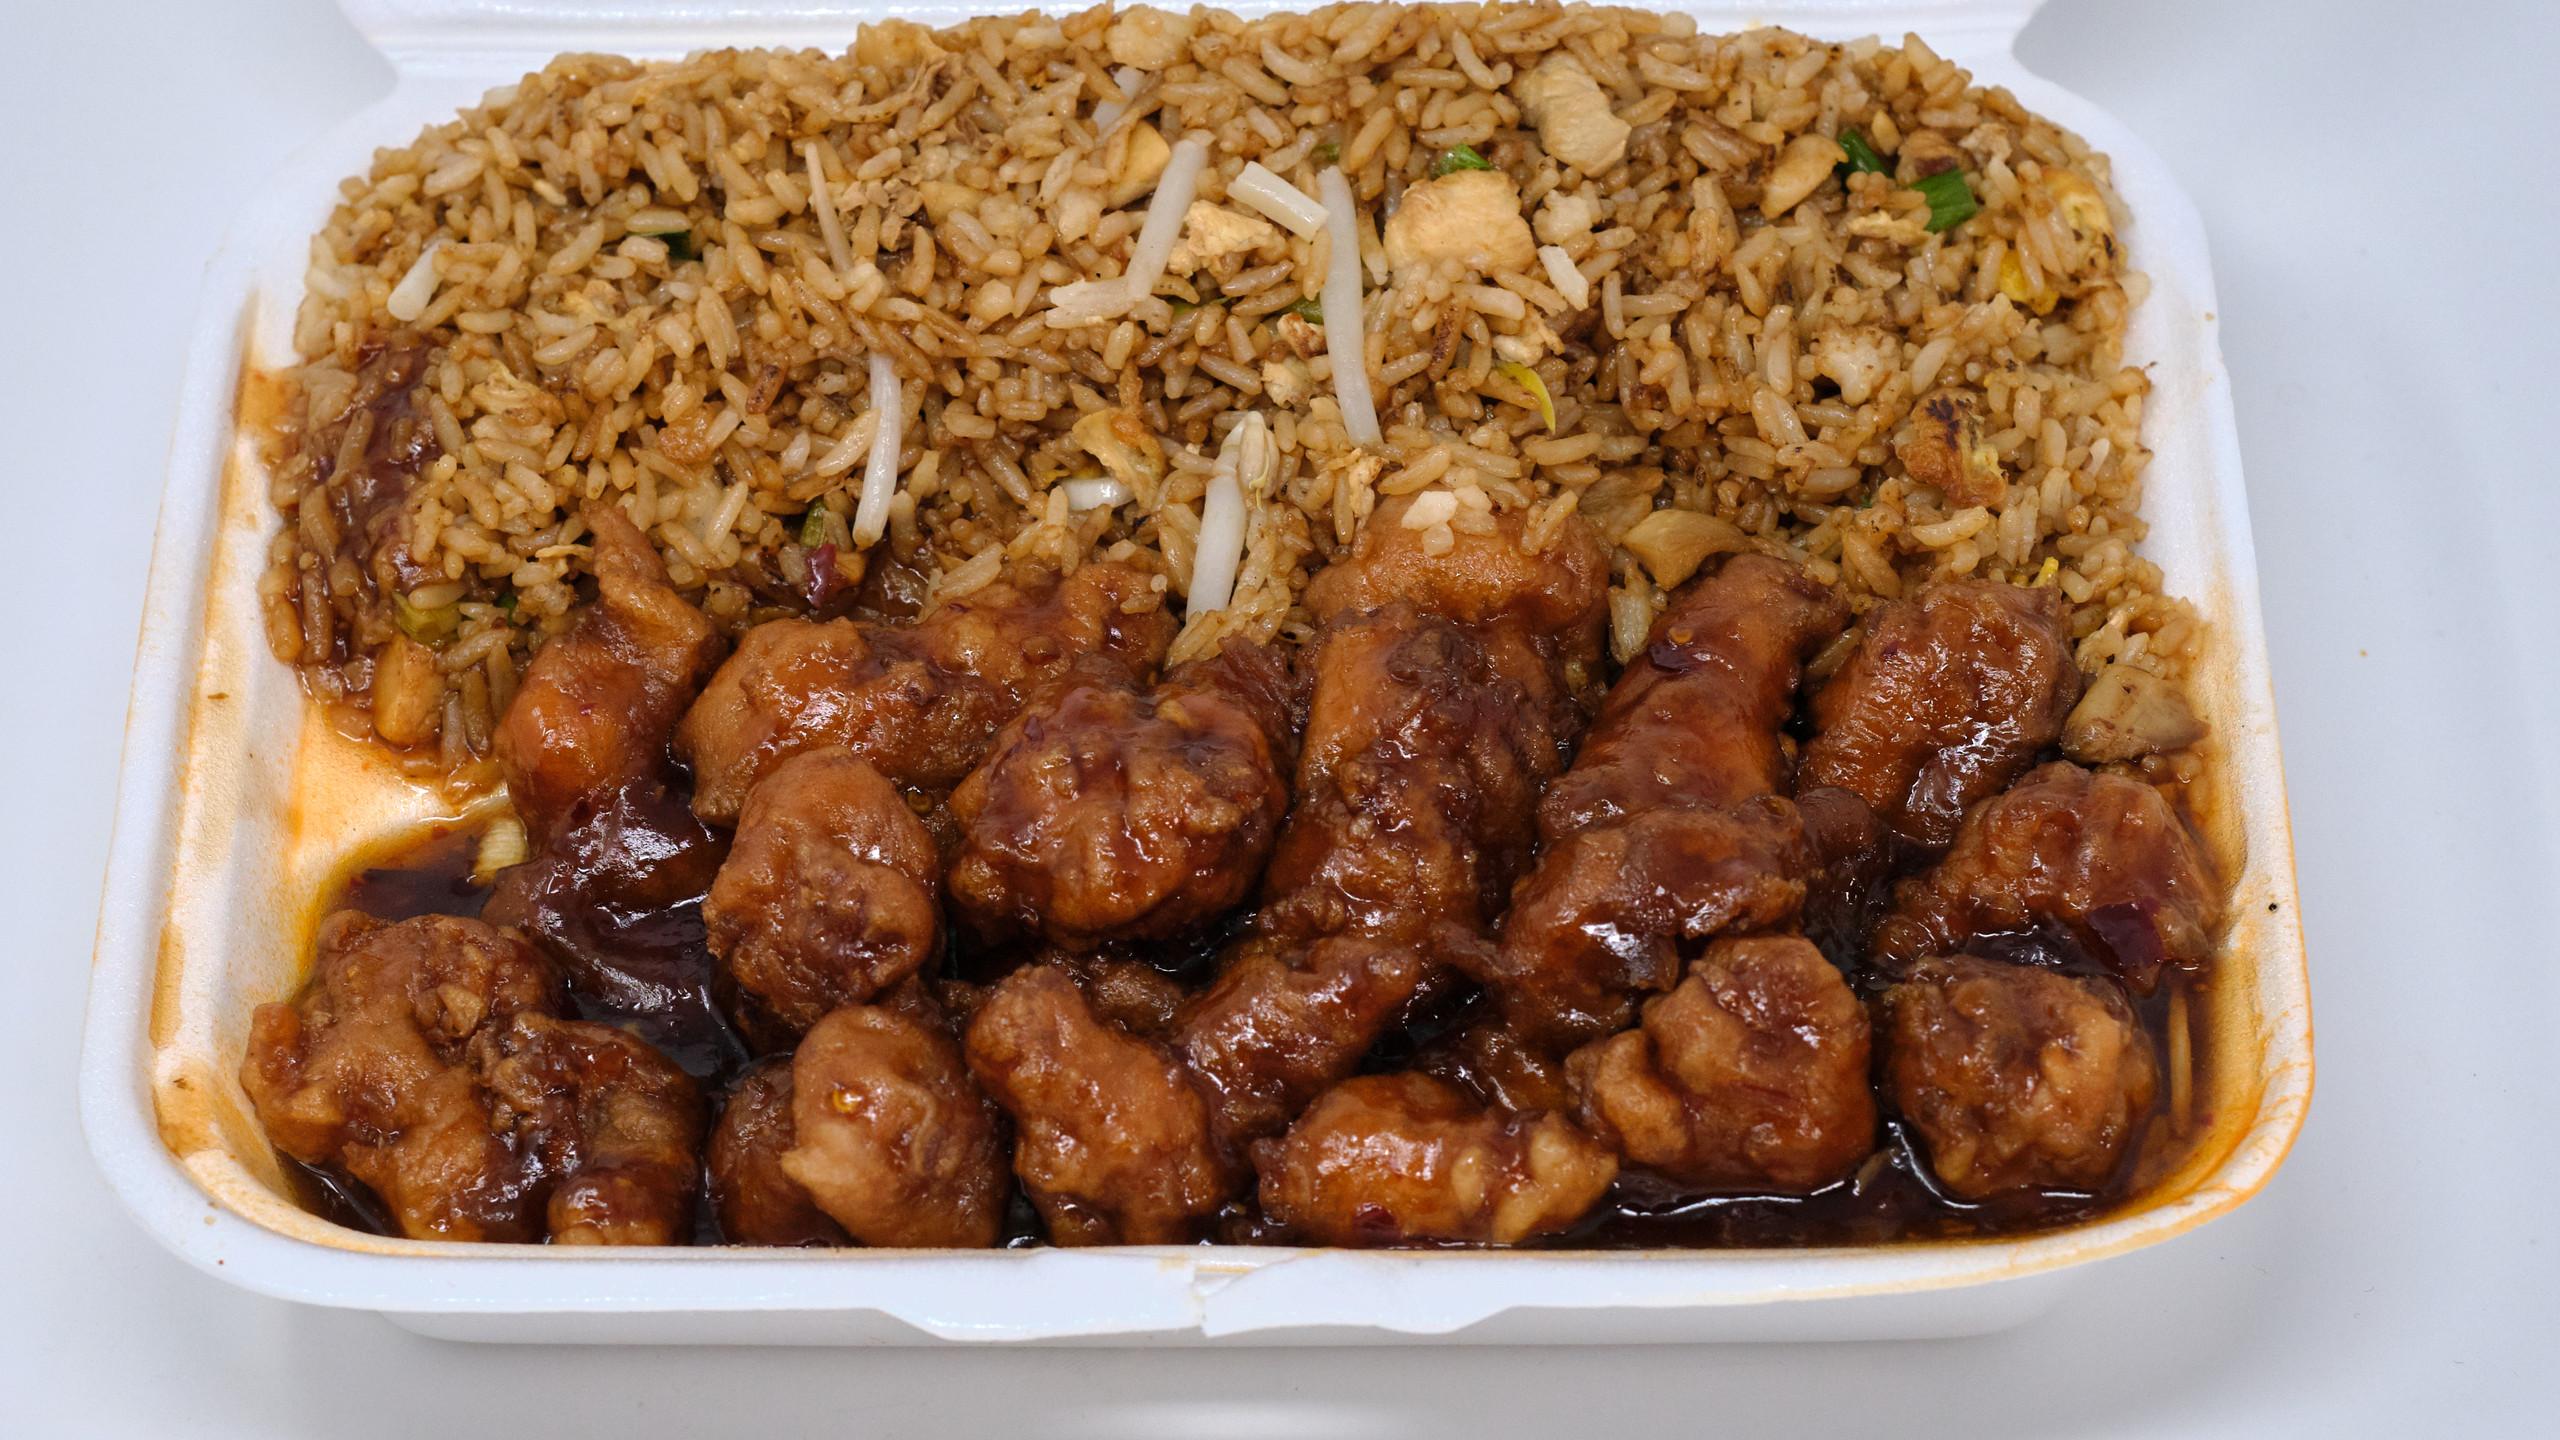 Tasty Chinese Food Orange Chicken Lunch Special